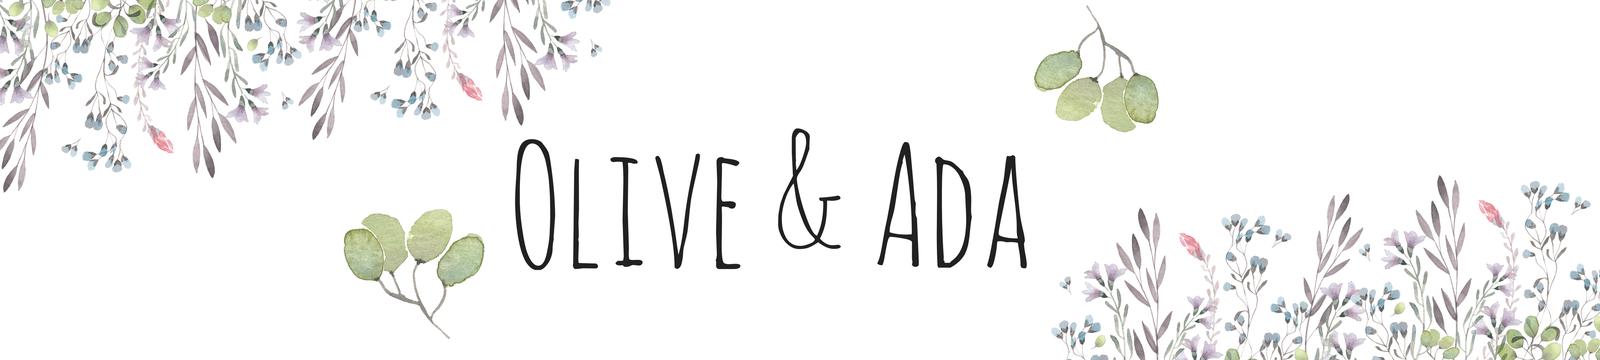 Olive & Ada